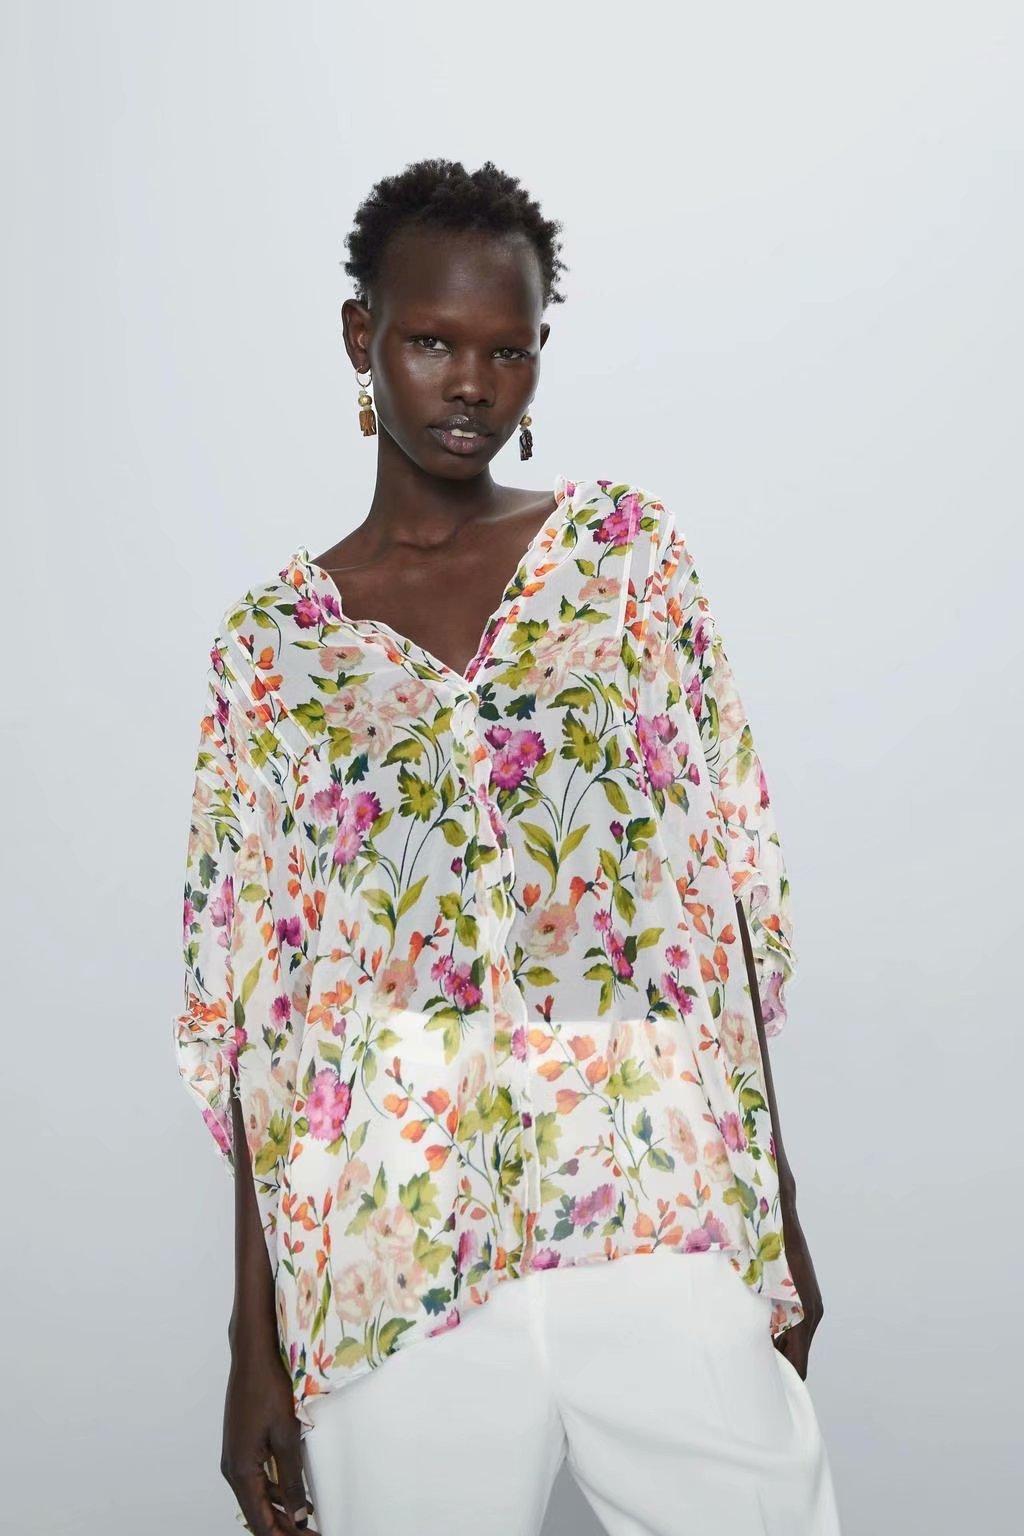 2020 New Spring Summer European Printed Zaraing Women Blouse Shirt Vadiming Sheining Female Shirt Blouse A9704